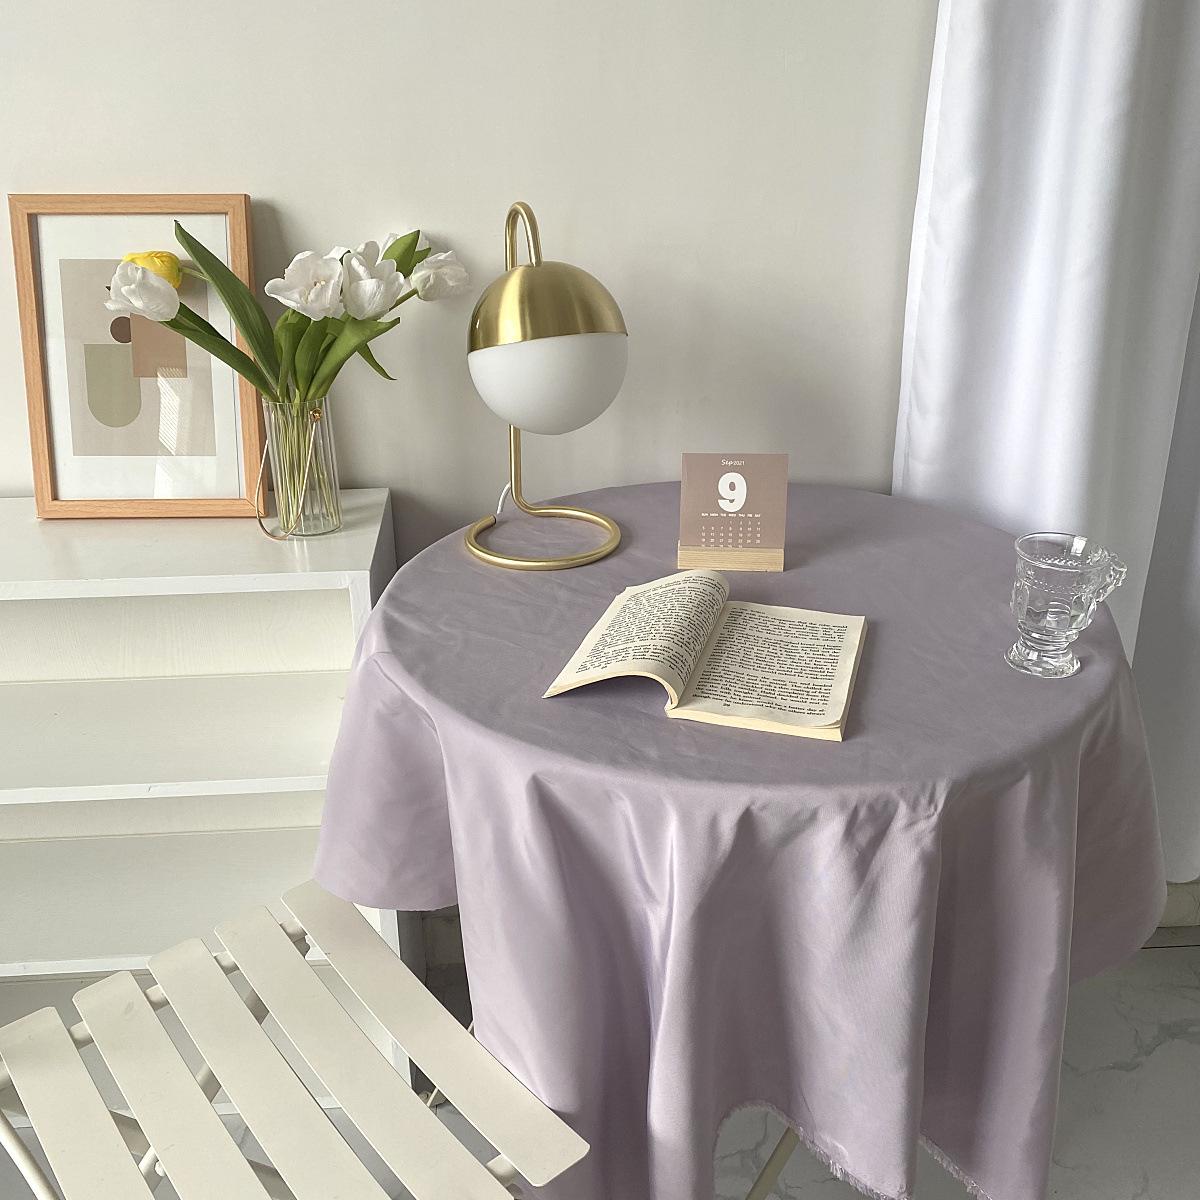 INS温柔的香芋紫复古可可棕软装搭配背景布拍照道具布桌布餐布